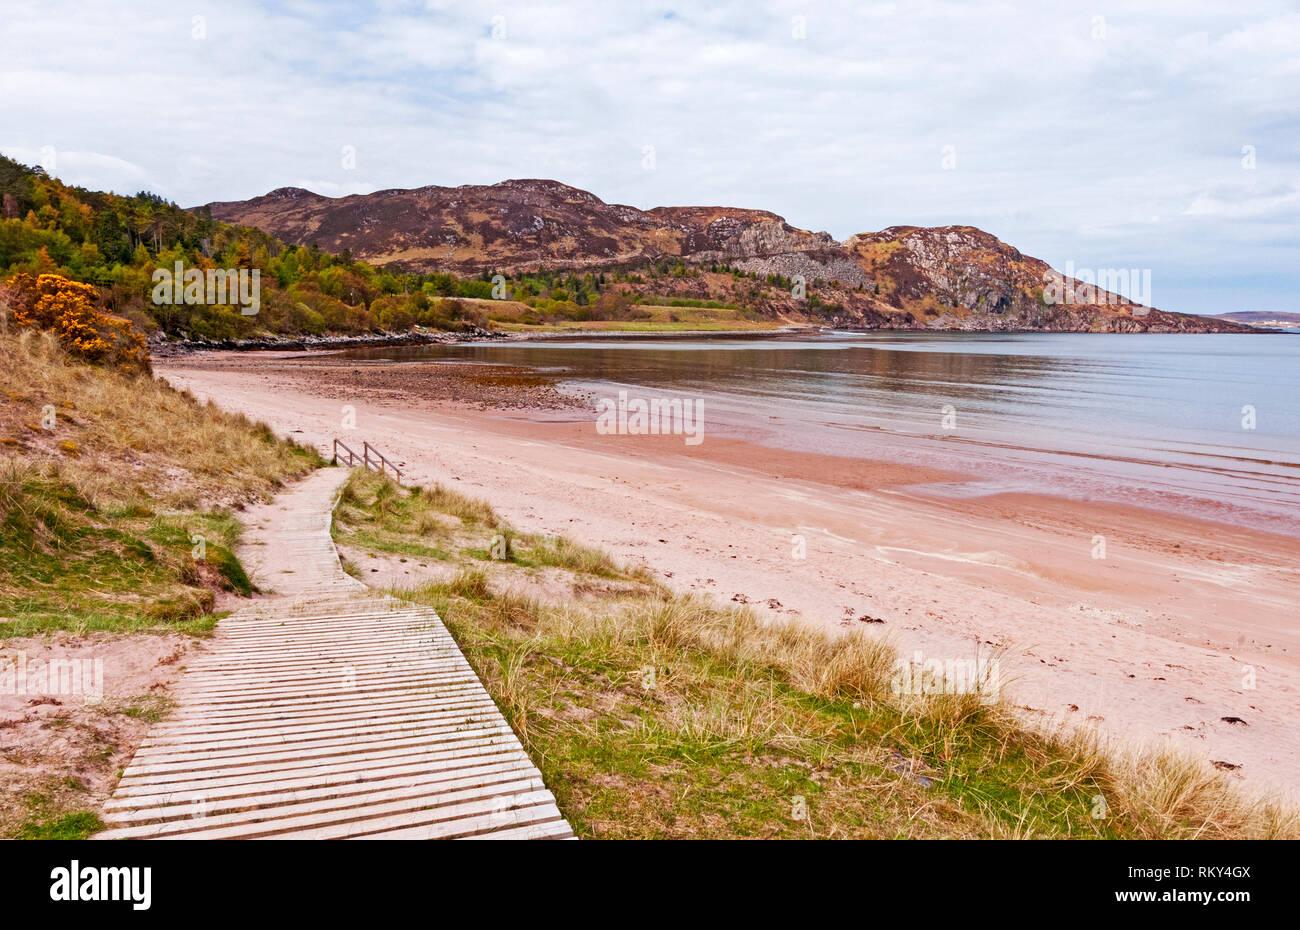 Gruinard Beach and Bay, Scotland - Stock Image